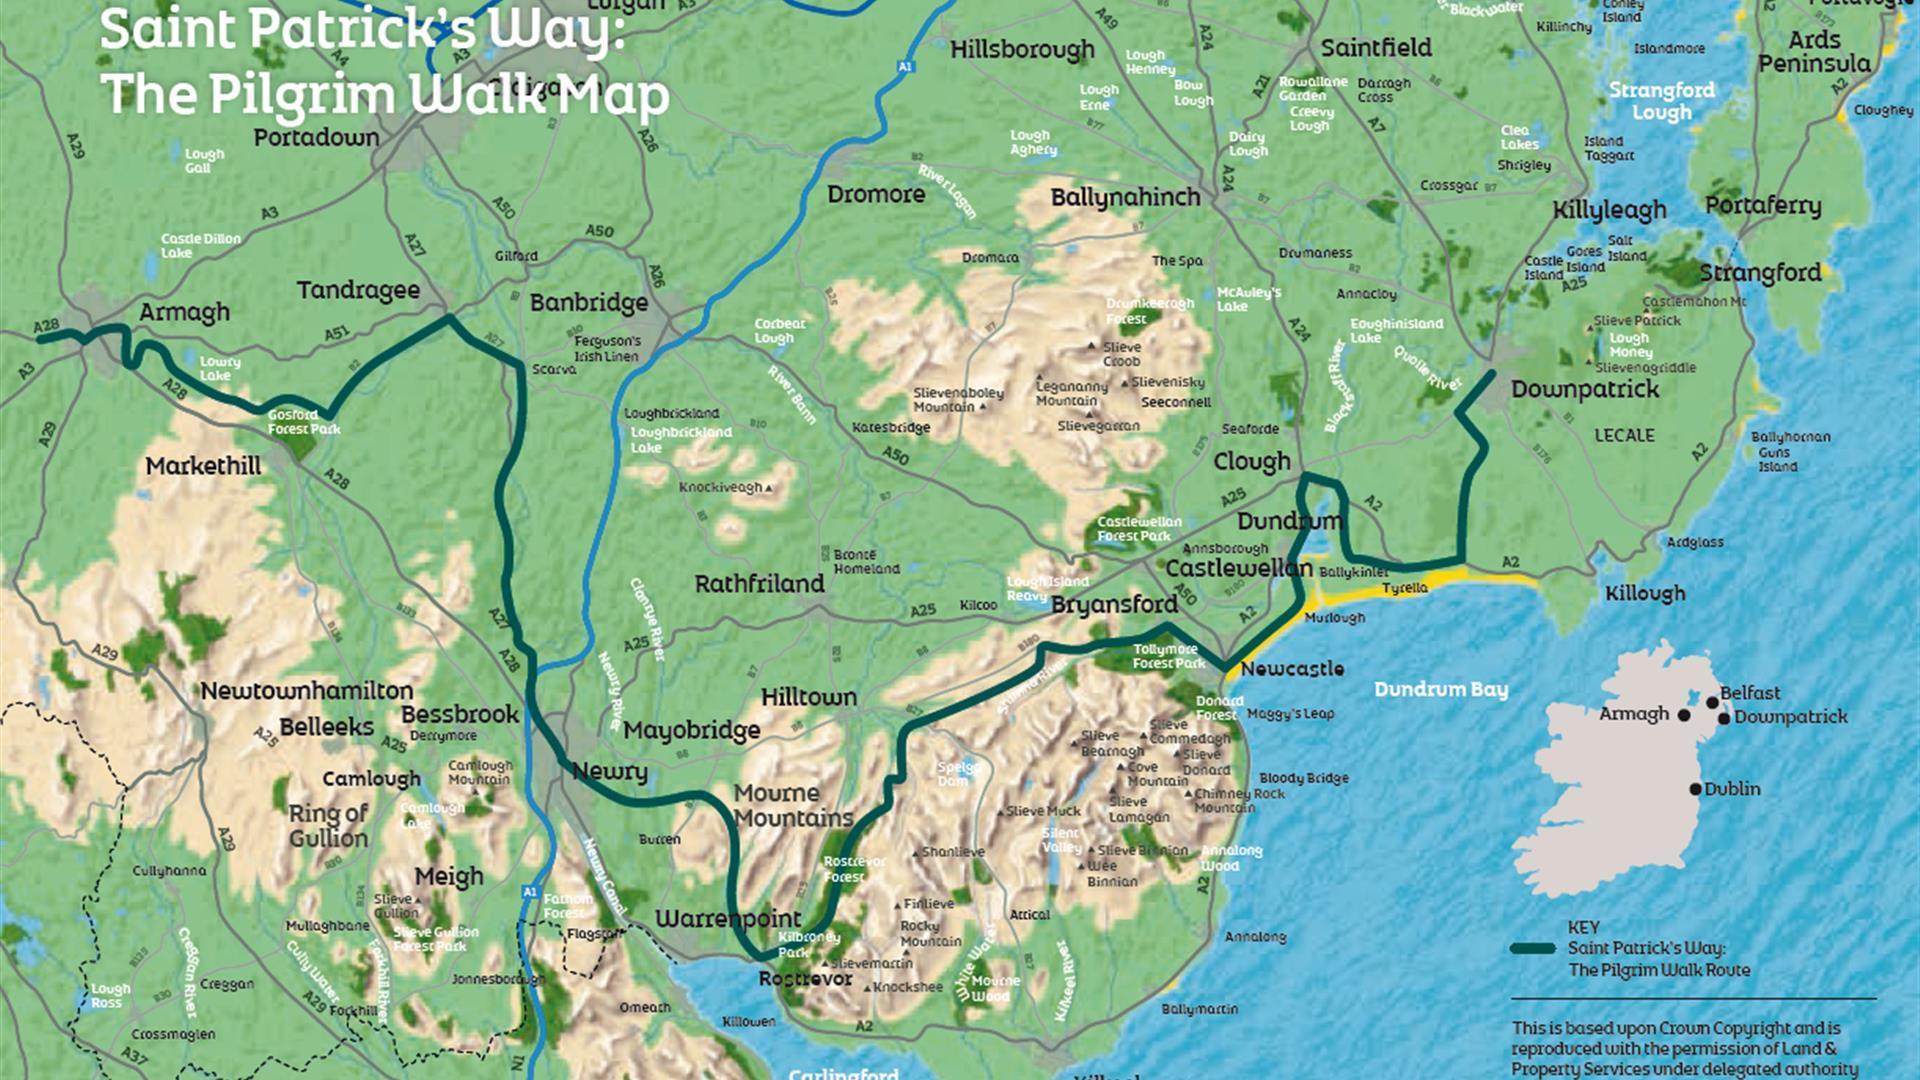 Saint Patrick's Way: The Pilgrim's Walk